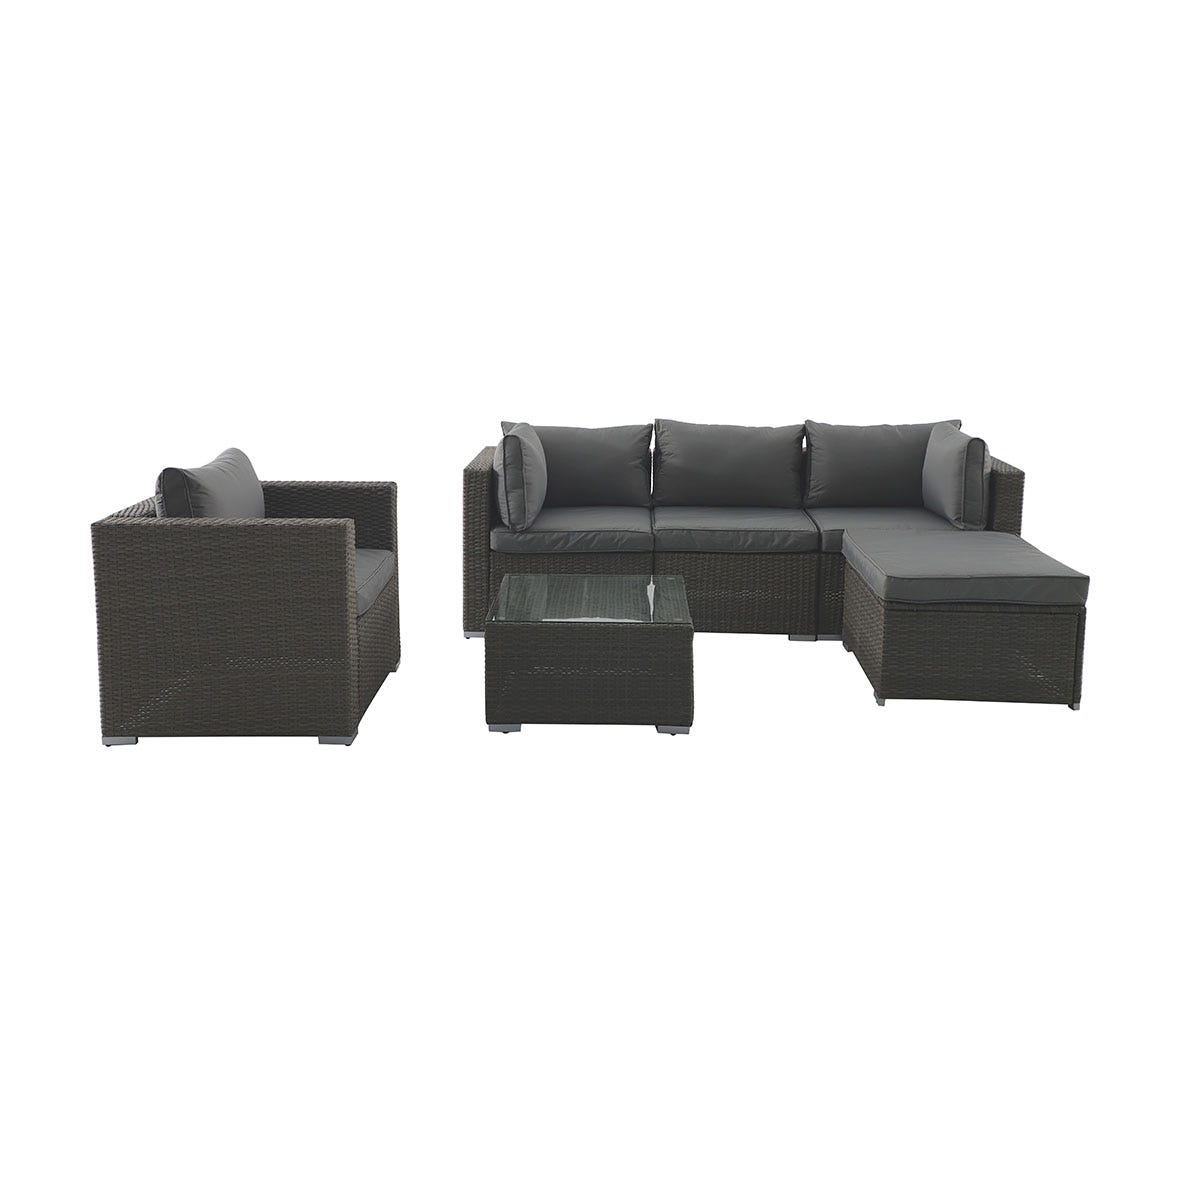 Creador 4-5 Seater Rattan Sofa Set - Brown/Grey